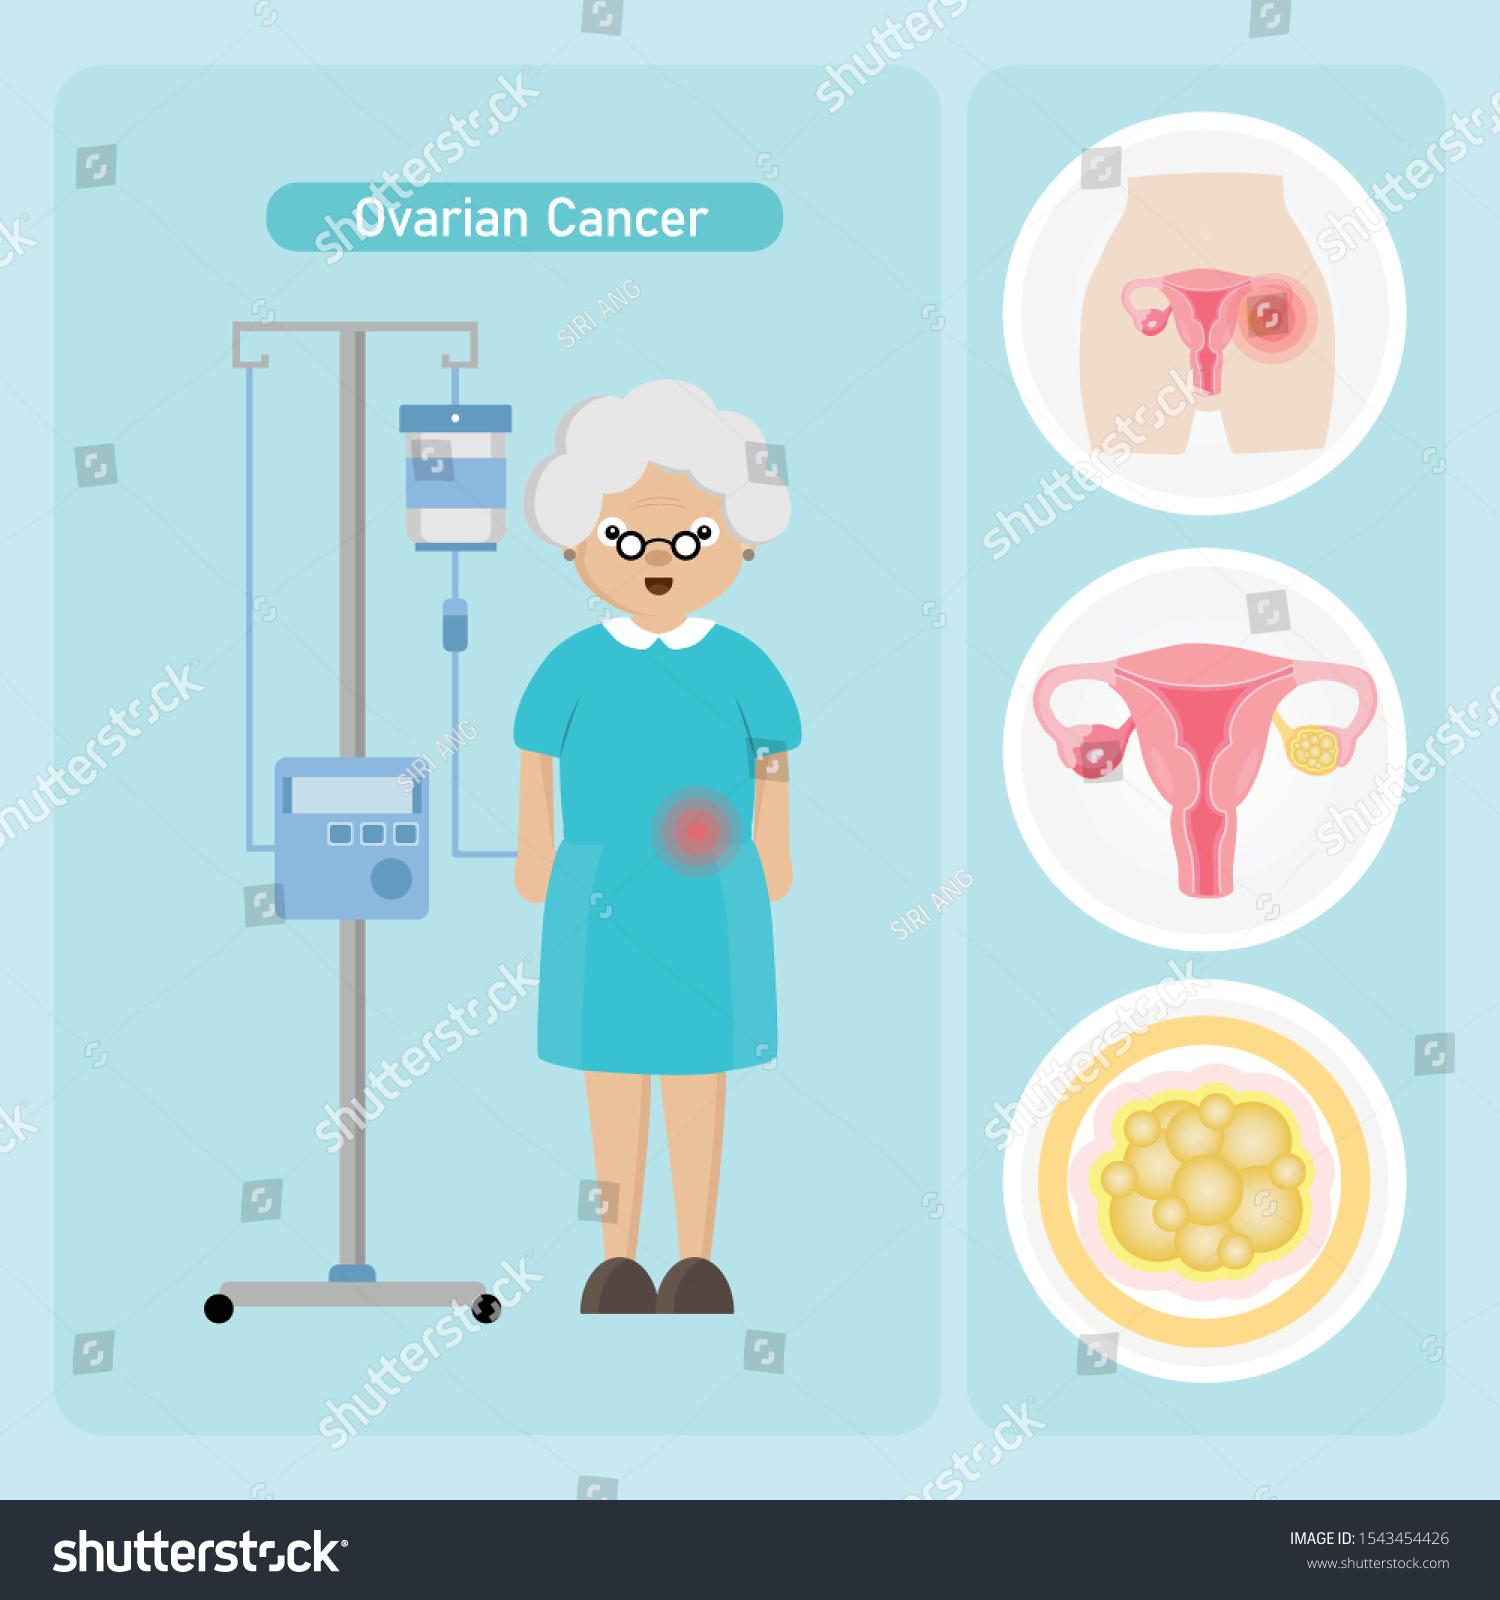 Senior Woman Patient Ovarian Cancer Cartoon Stock Vector Royalty Free 1543454426